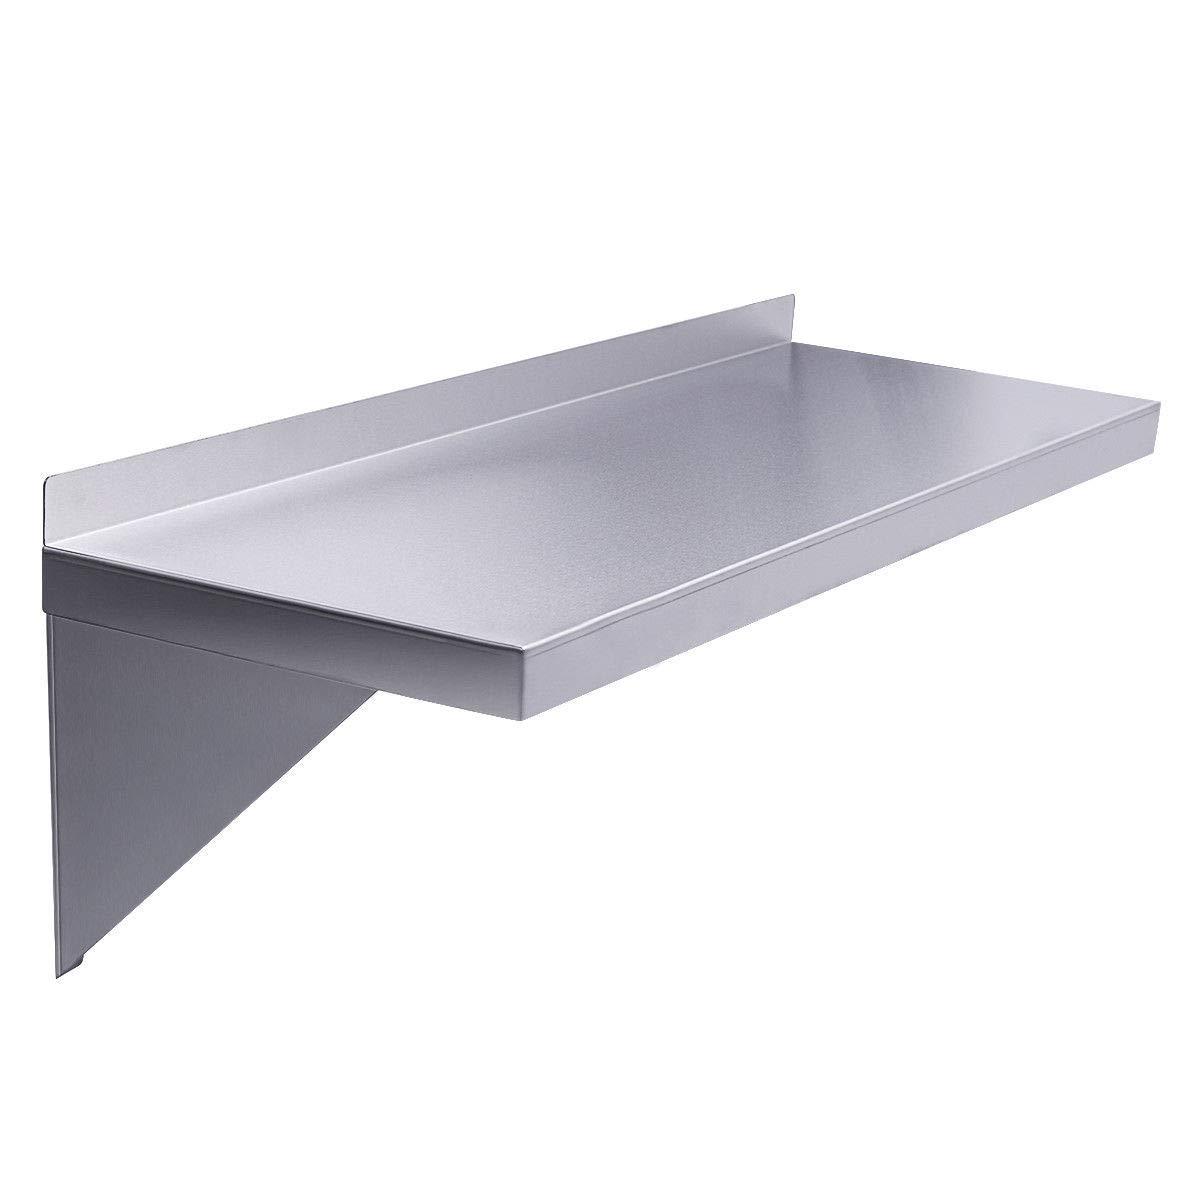 Caraya 12''X72'' Floating Wall Shelf Steel Restaurant Bar Kitchen Storage Wall shelf